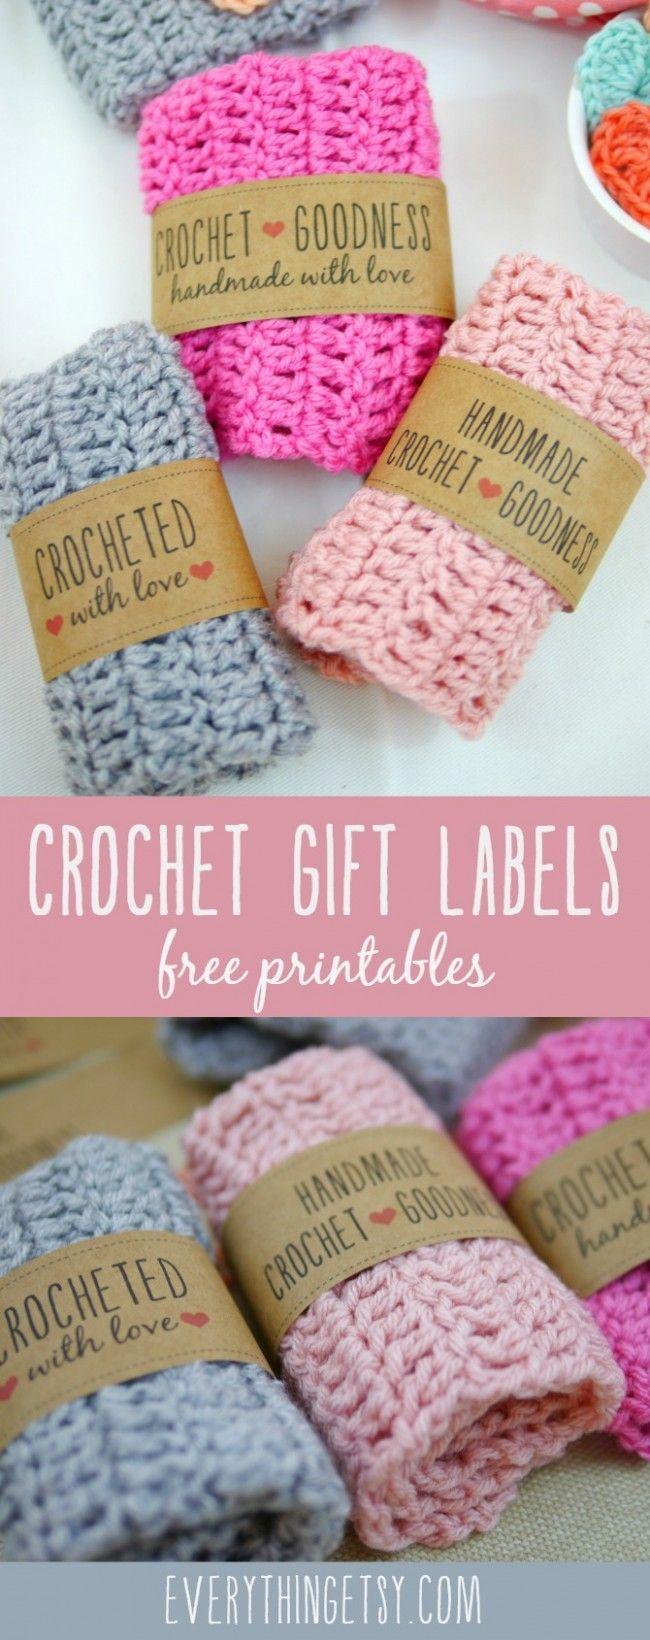 Free Printable Crochet Gift Labels - EverythingEtsy.com #crochet #printables #diy